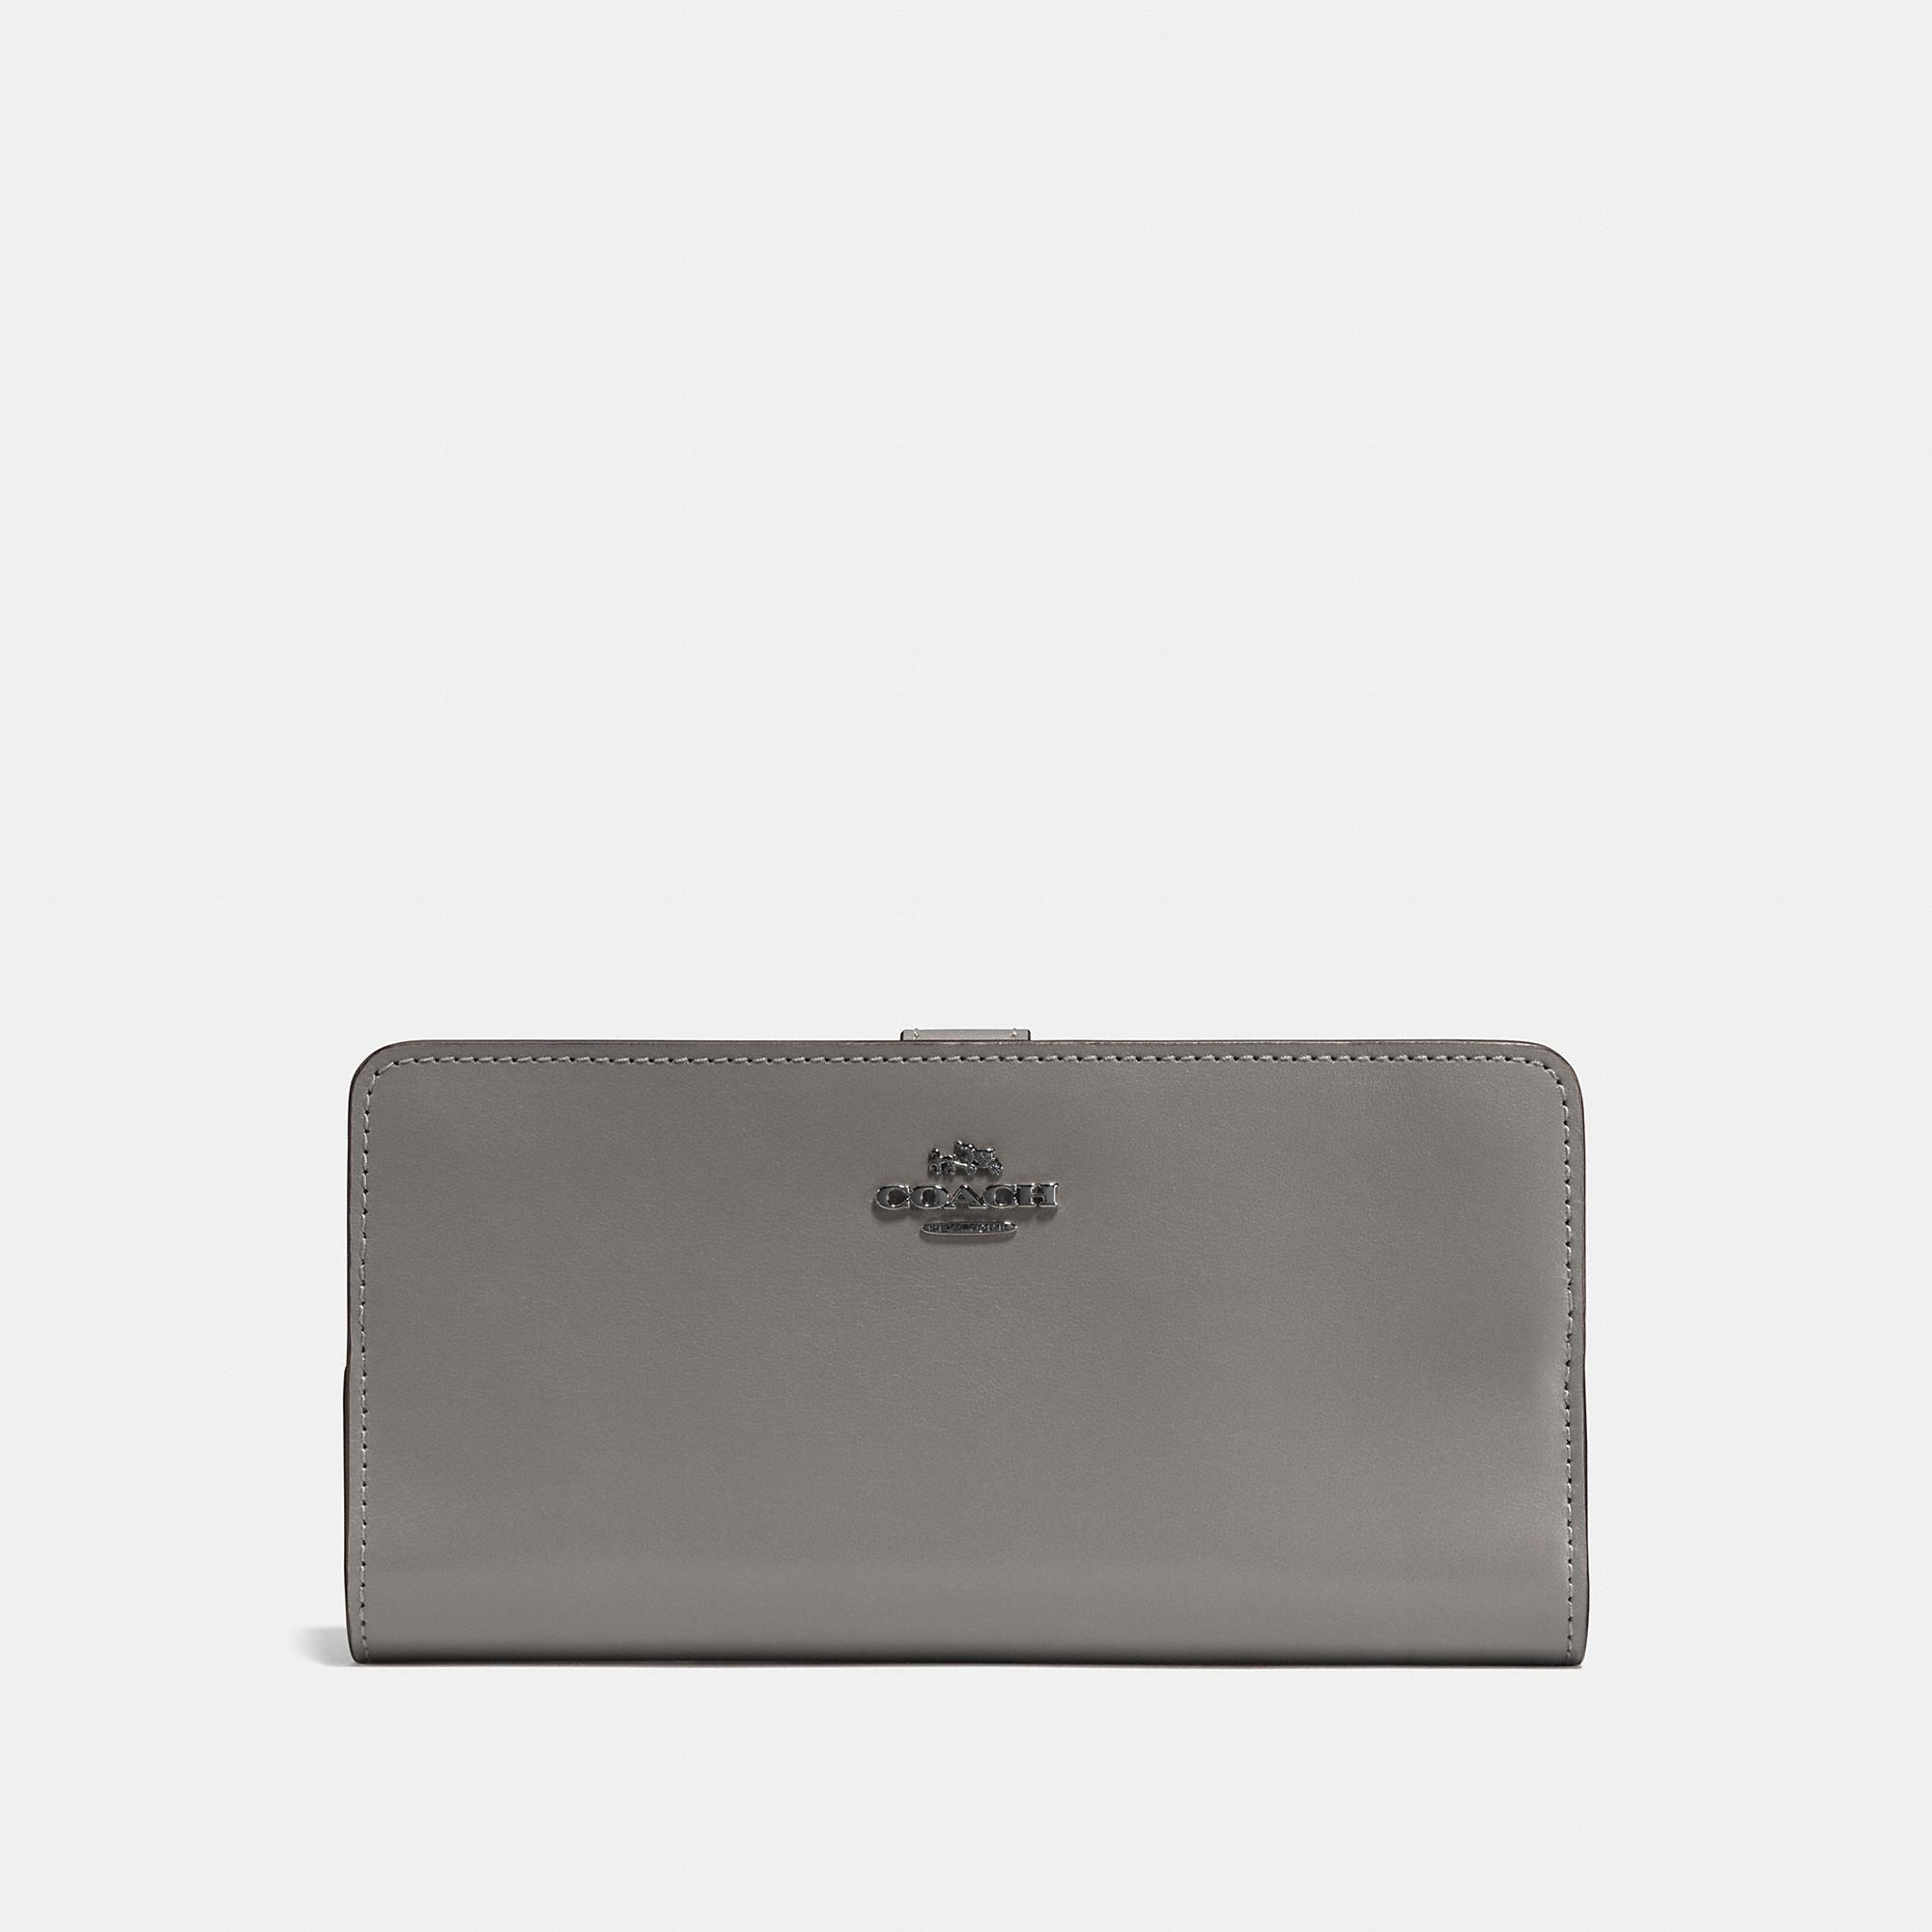 0a7f1a604e2b Lyst - COACH Skinny Wallet in Gray